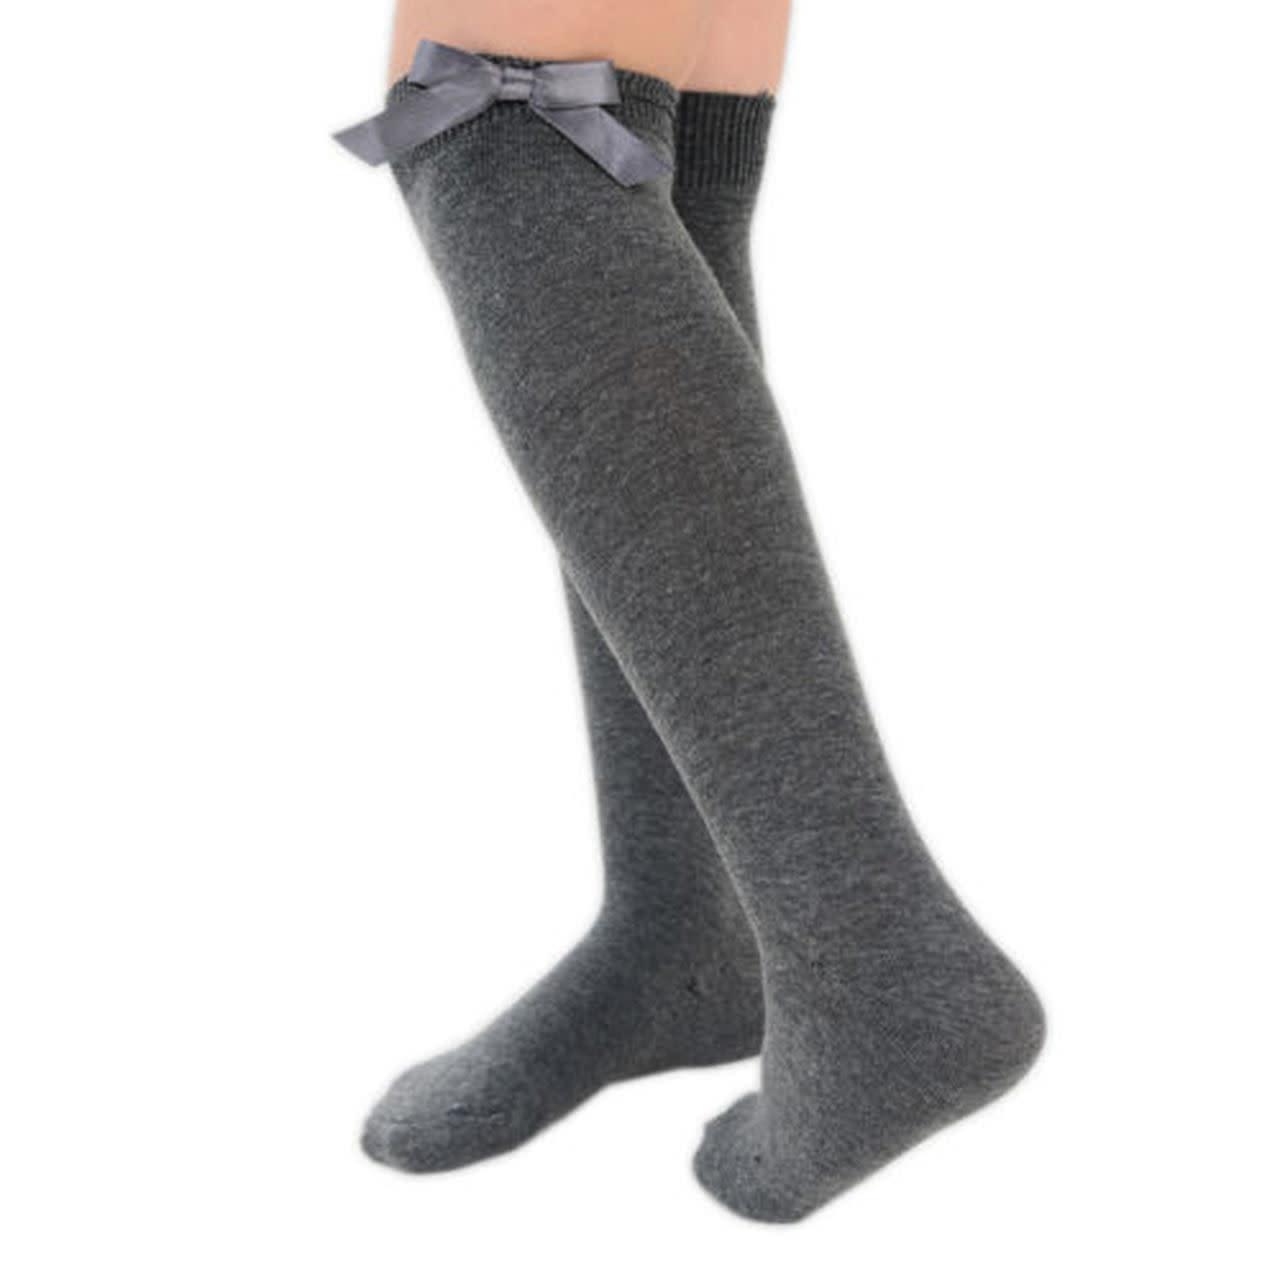 Pex Pex Grey Knee High Socks